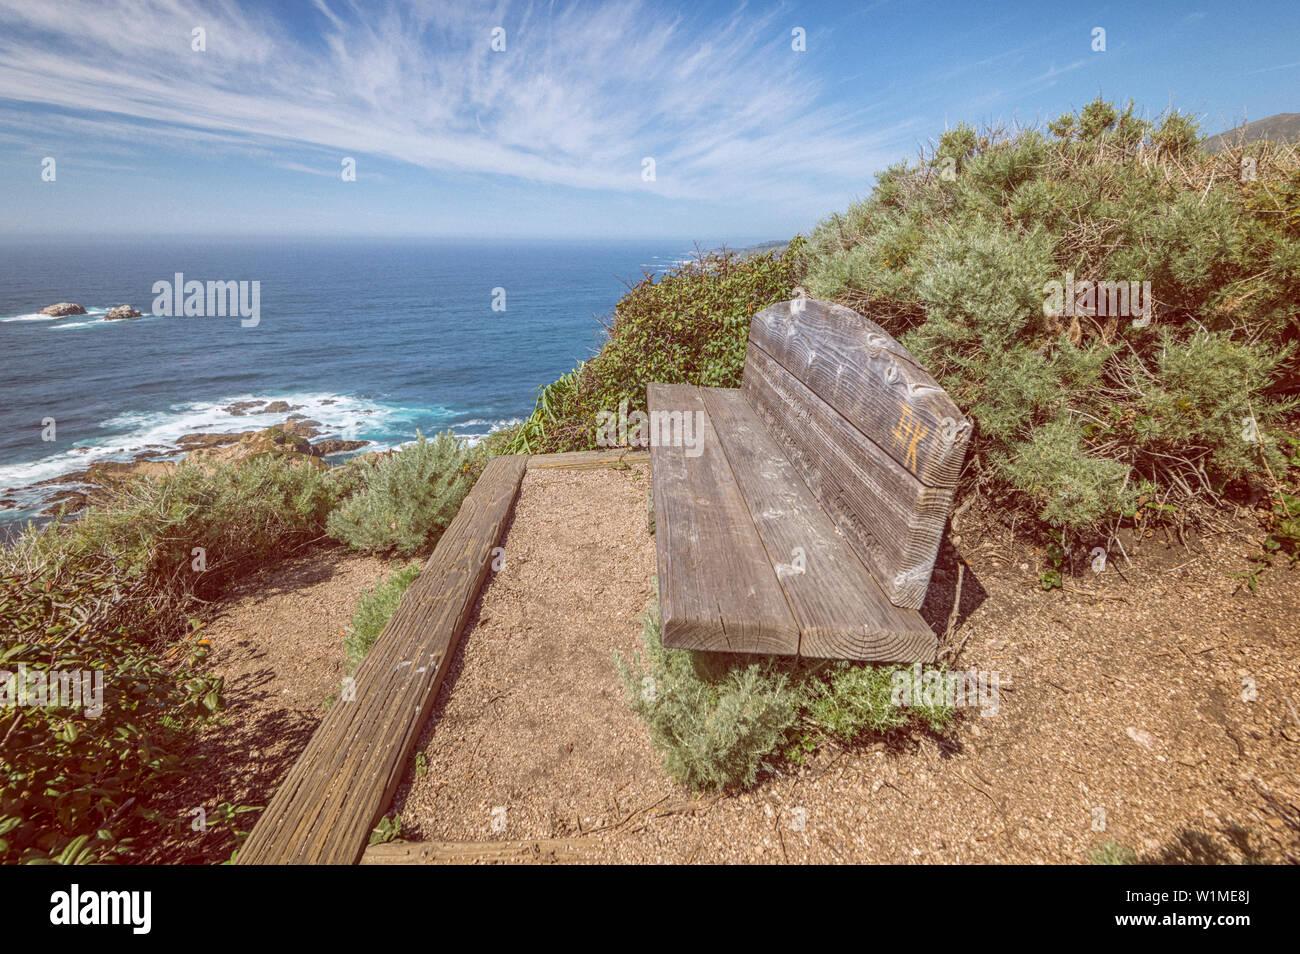 Monterey Park datant